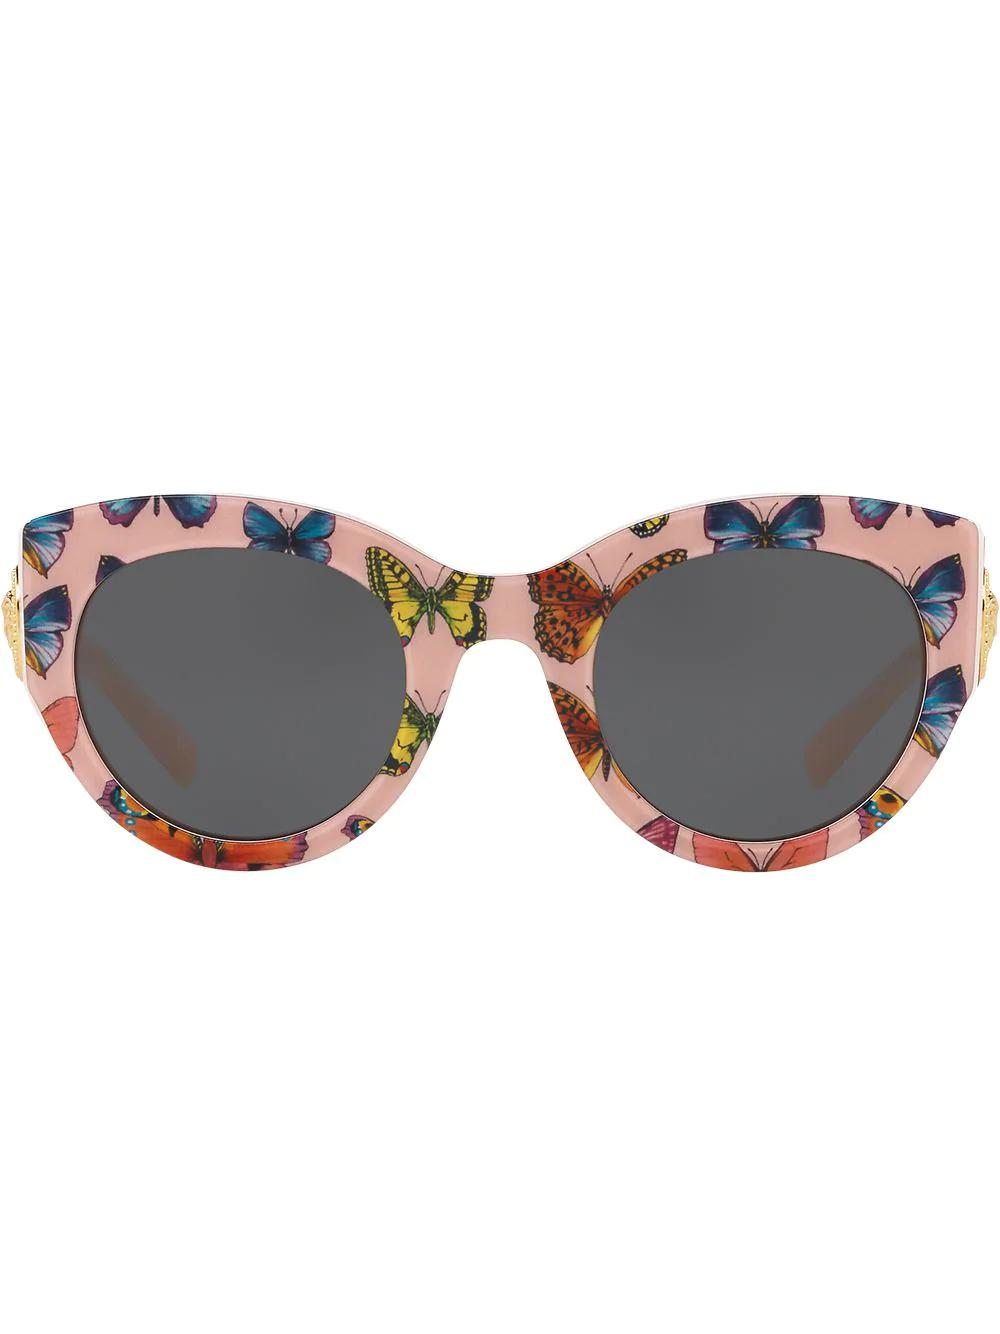 8869677802 Versace Eyewear Tribute Butterfly Print Sunglasses - Pink. Farfetch